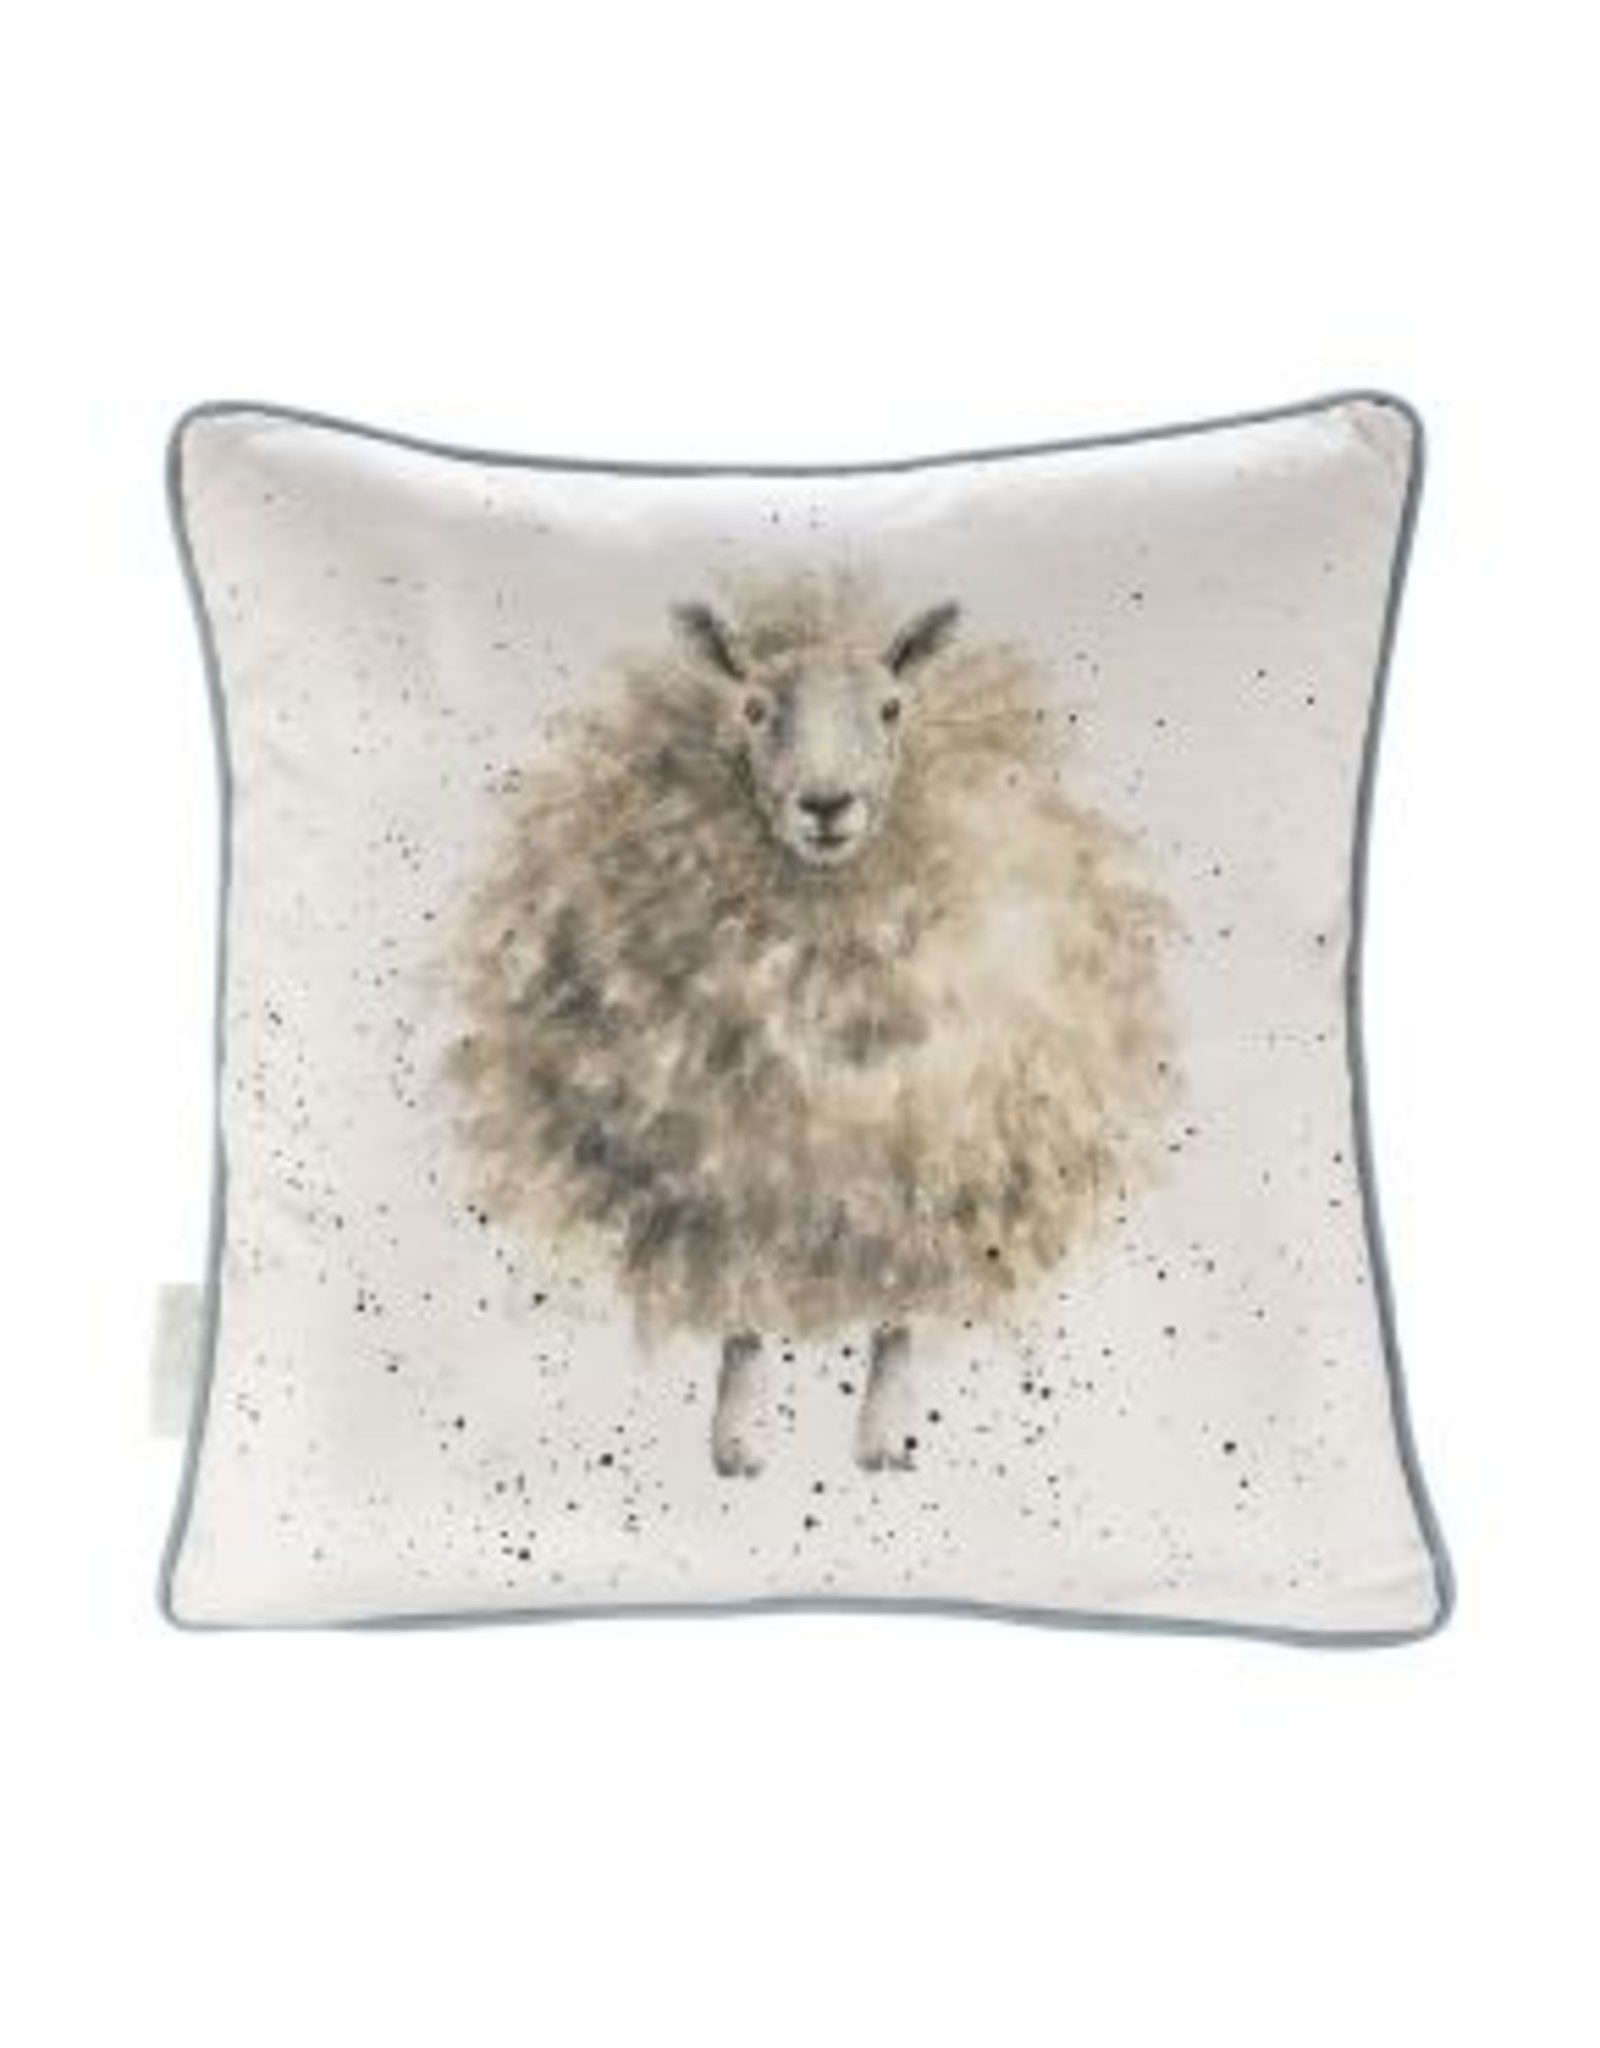 Wrendale Designs Cushion - Wolly Jumper Sheep